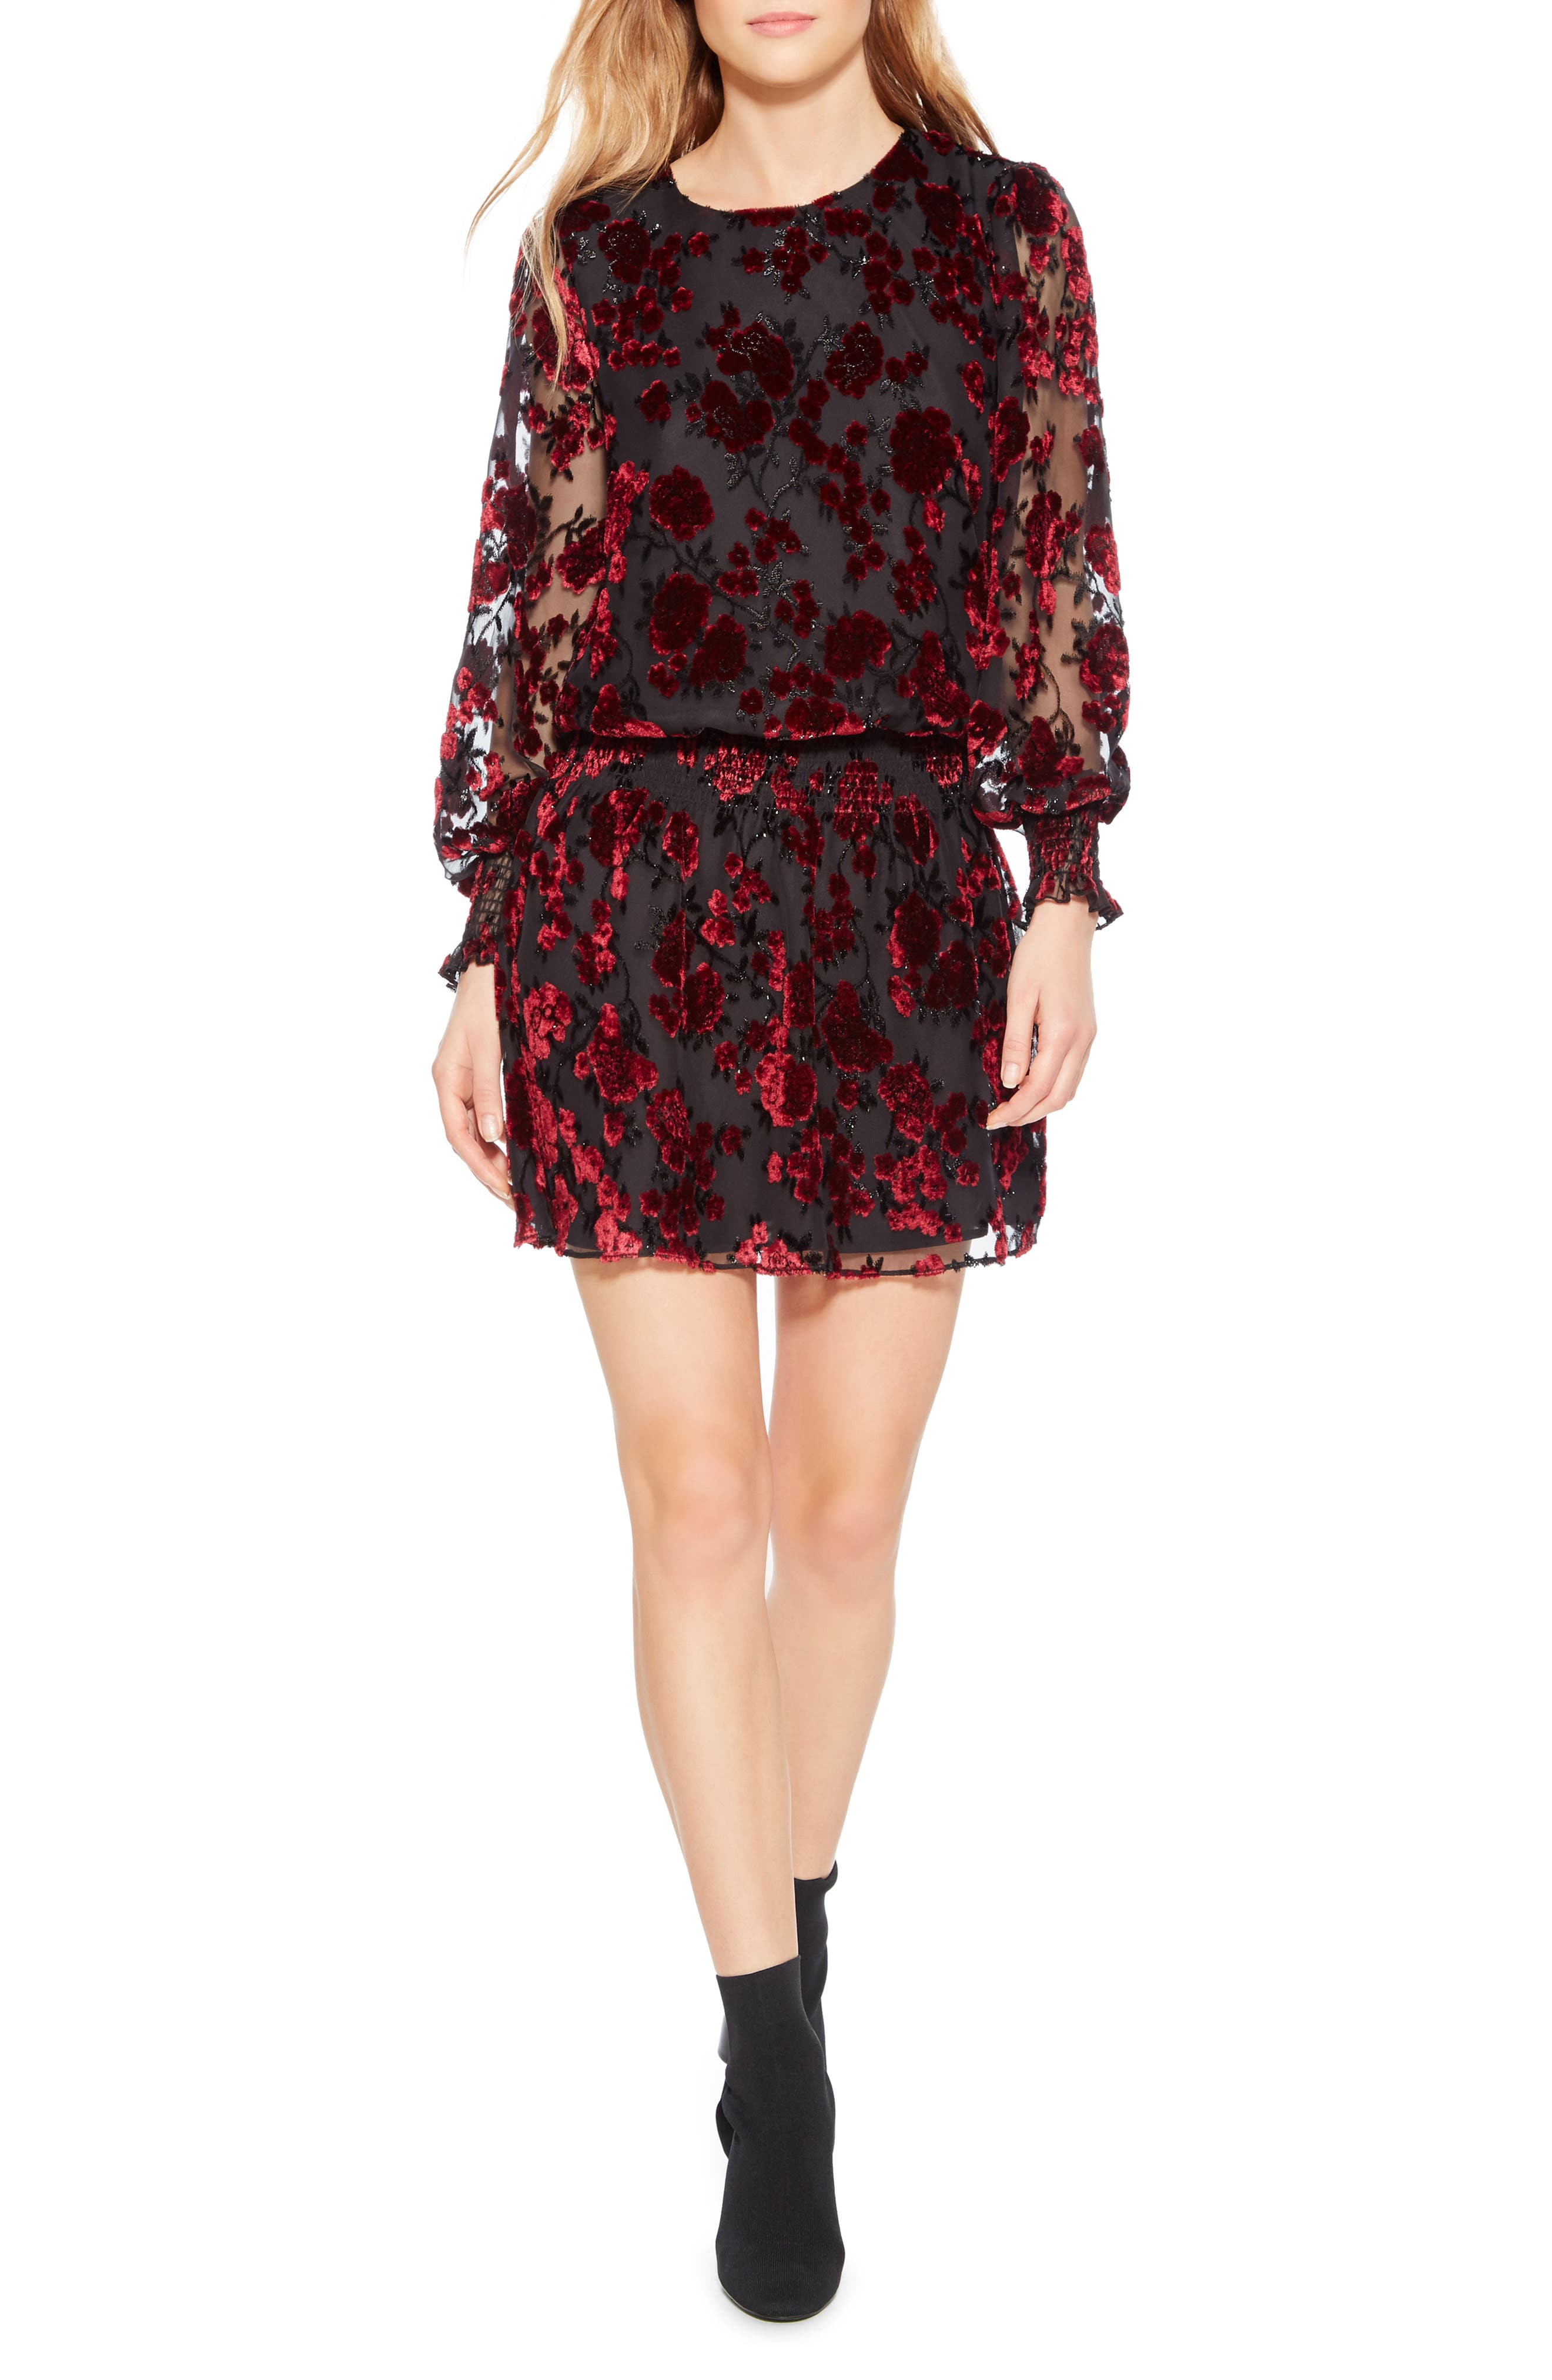 Carmindy Smocked Minidress,                         Main,                         color, MERLOT